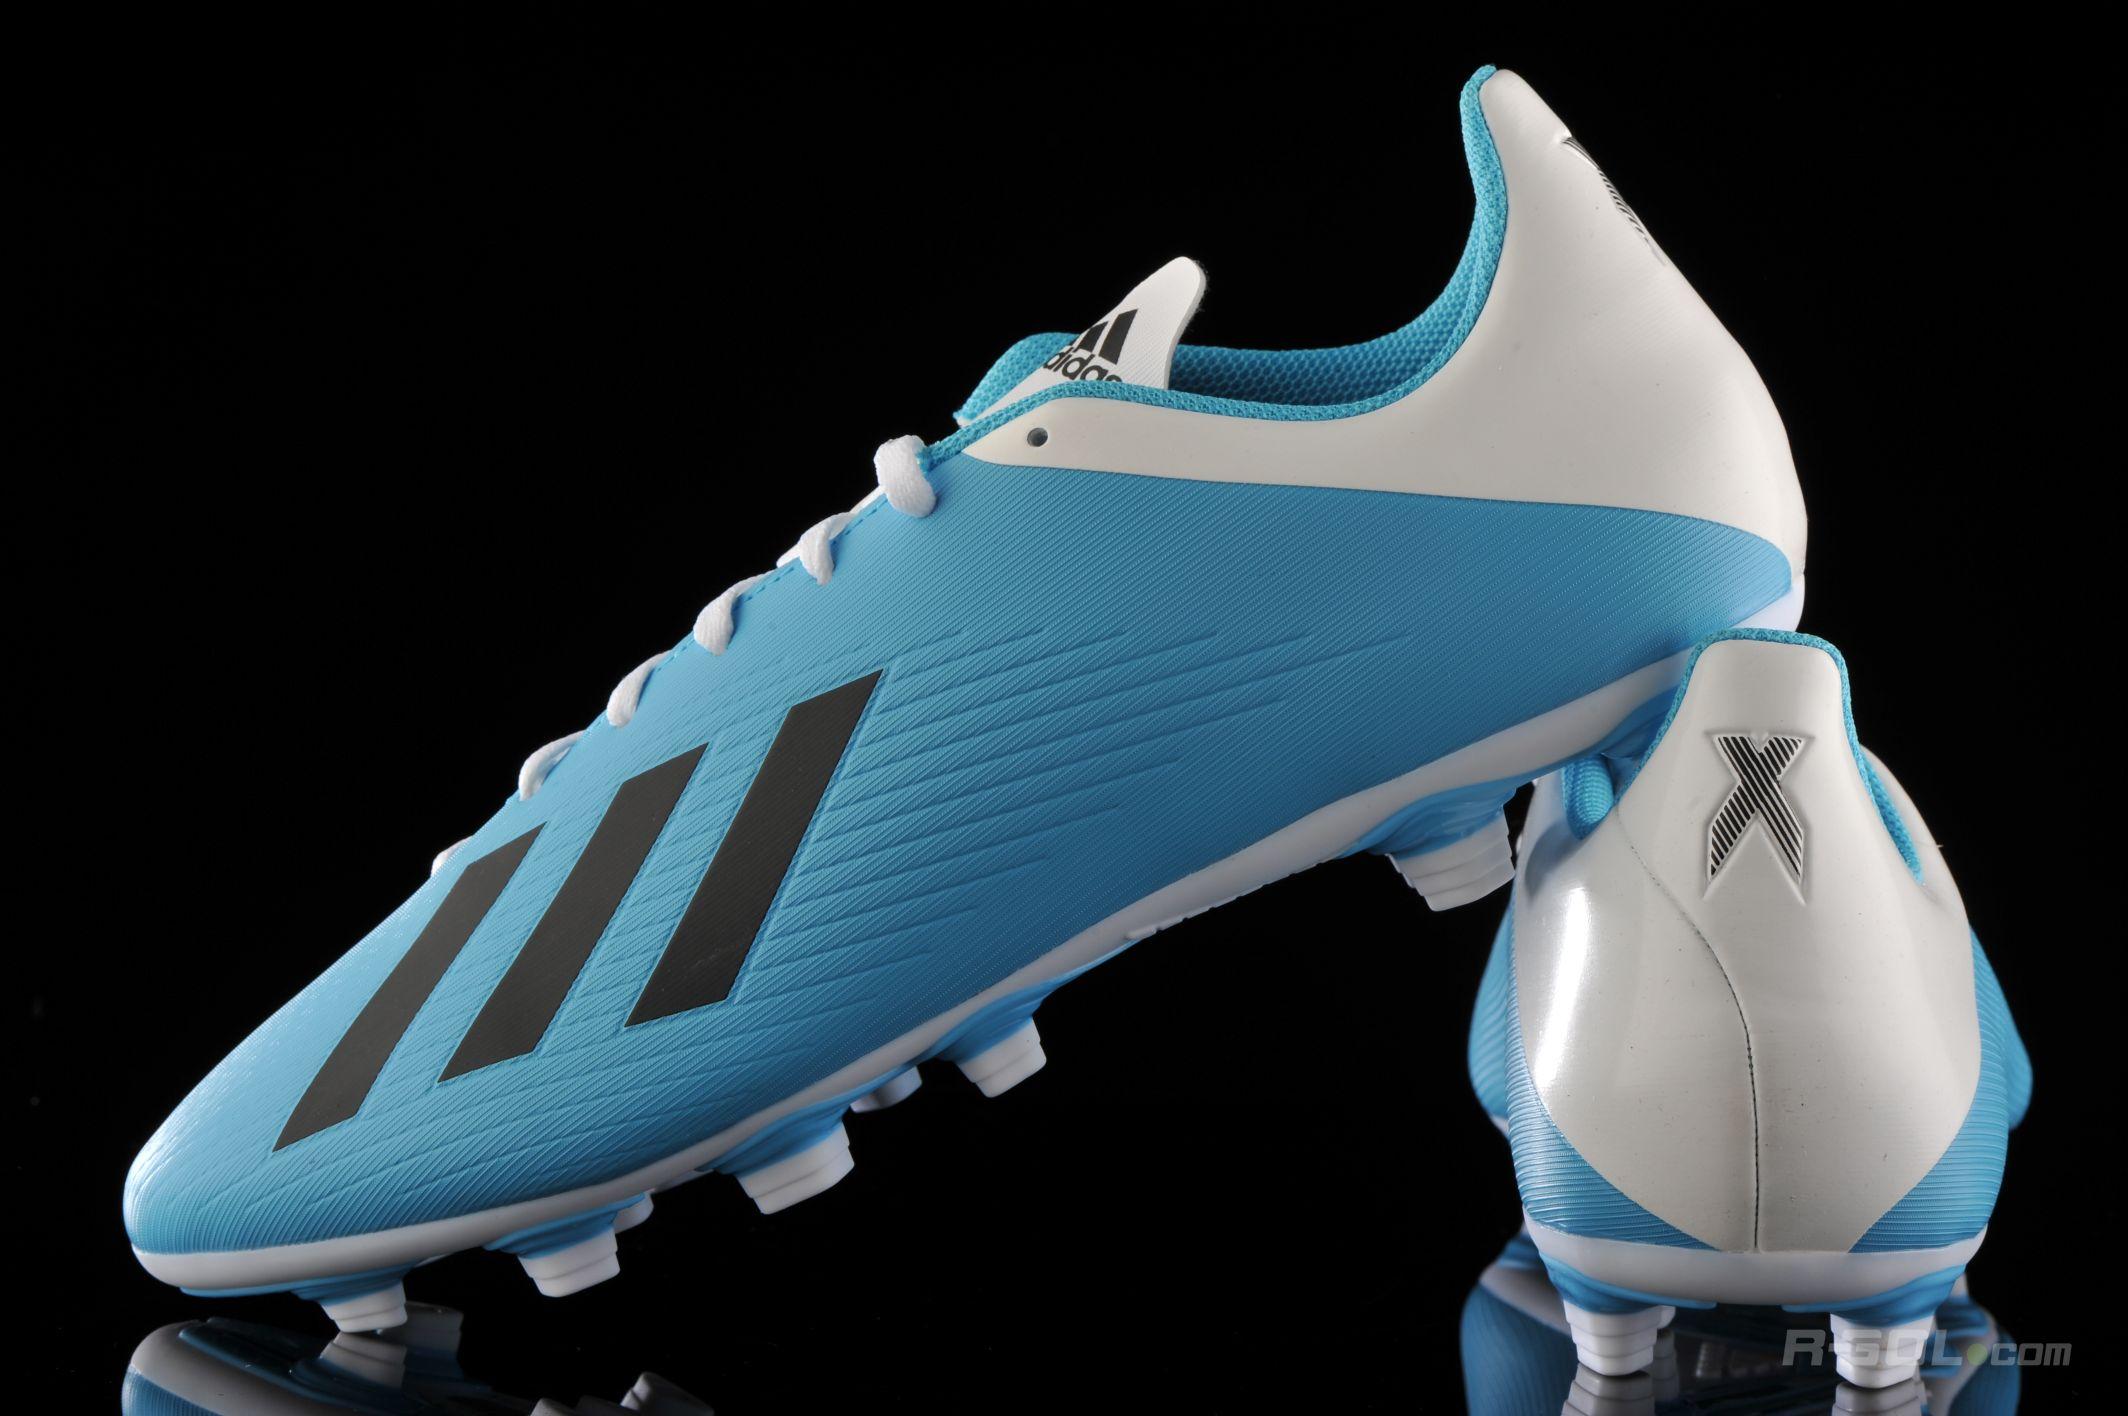 graffiare così tanto Crollo  Adidas X 19.4 Firm Ground Football Boots